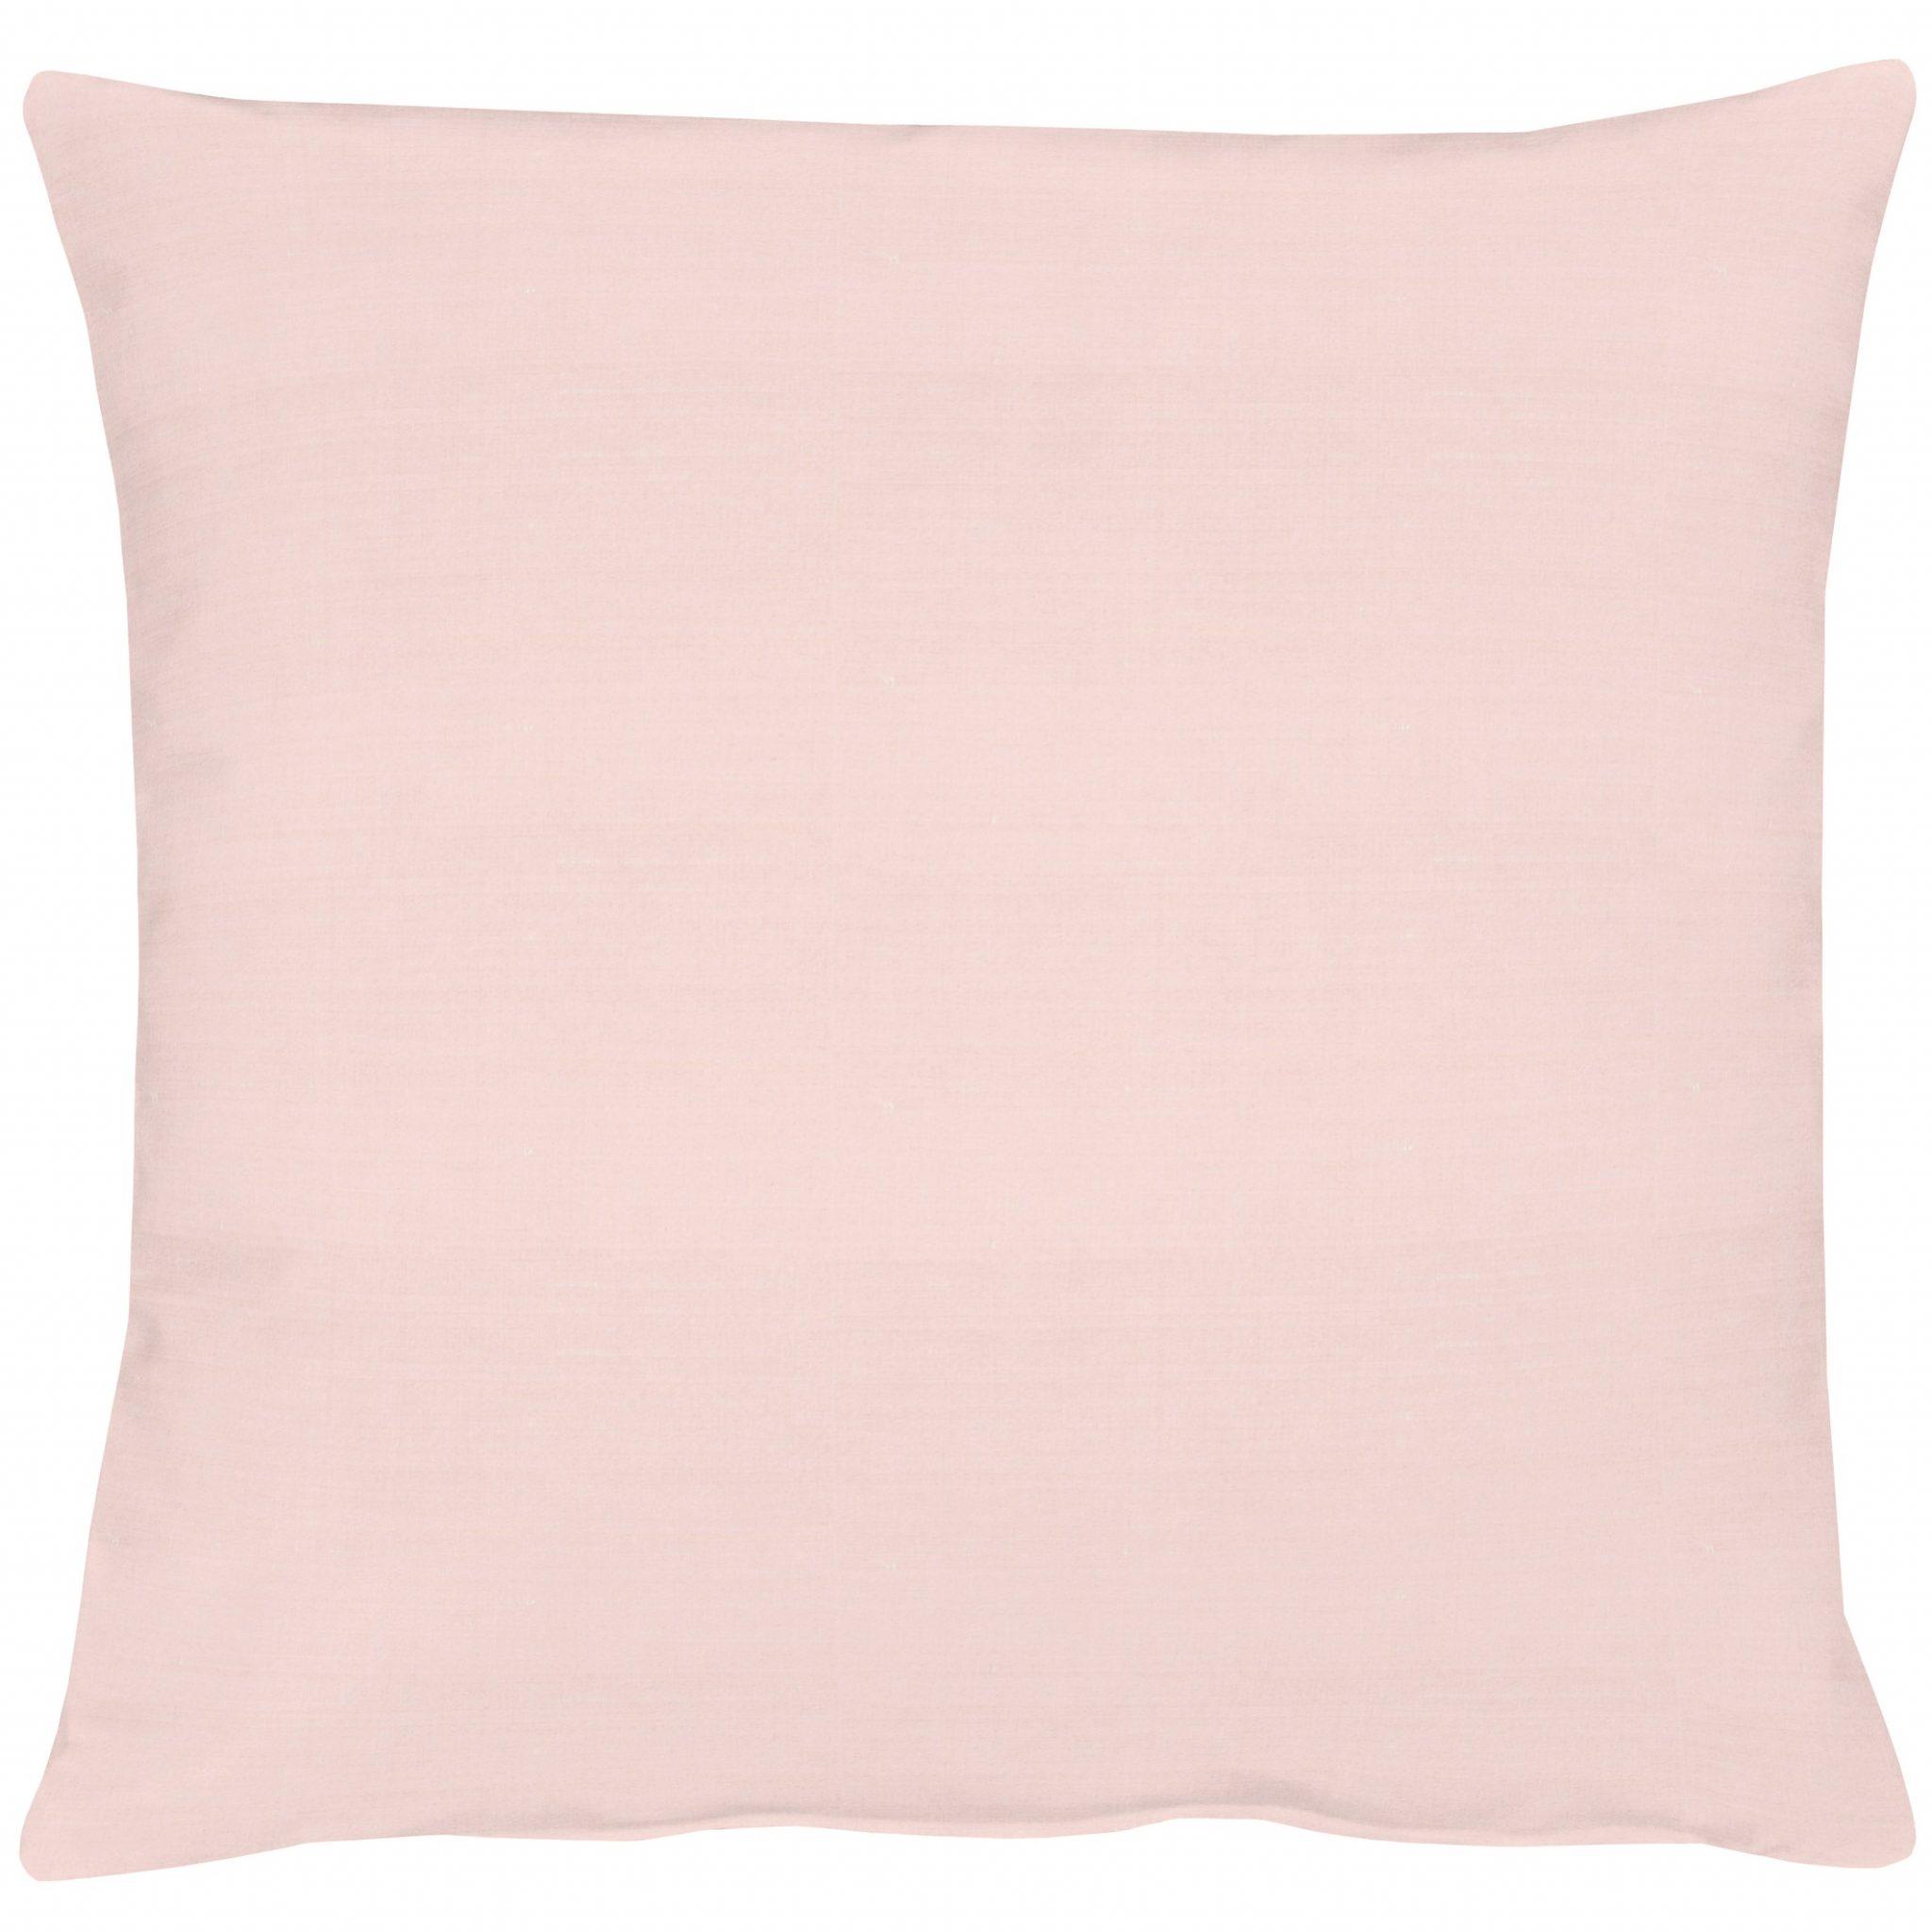 Dekokissen Apelt IMPERIAL 45x45 Seide rosa